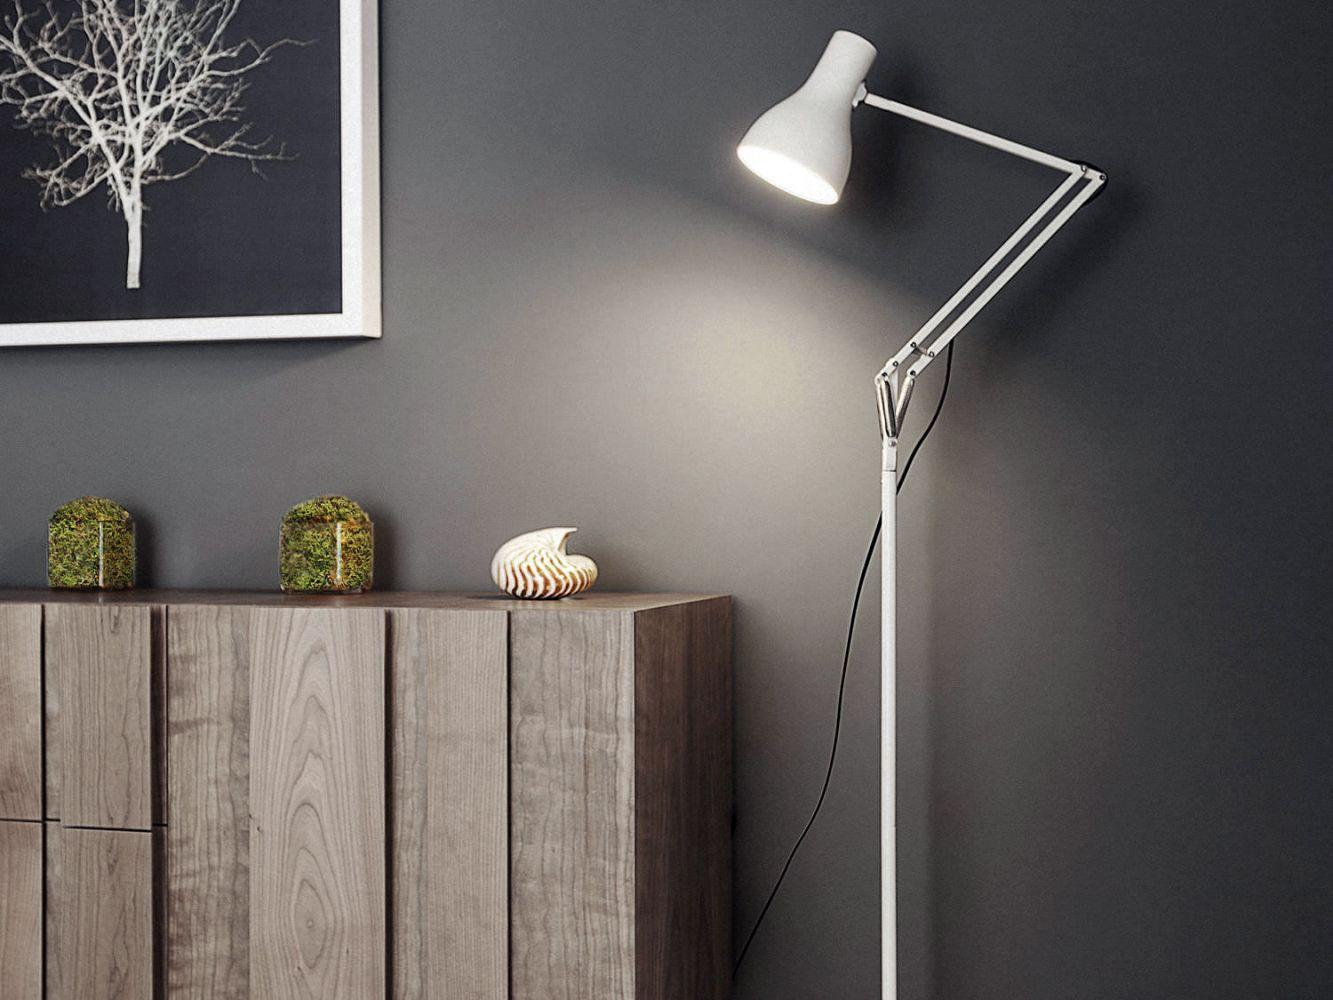 anglepoise fabricant anglais de luminaires meuble et d coration marseille mobilier design. Black Bedroom Furniture Sets. Home Design Ideas